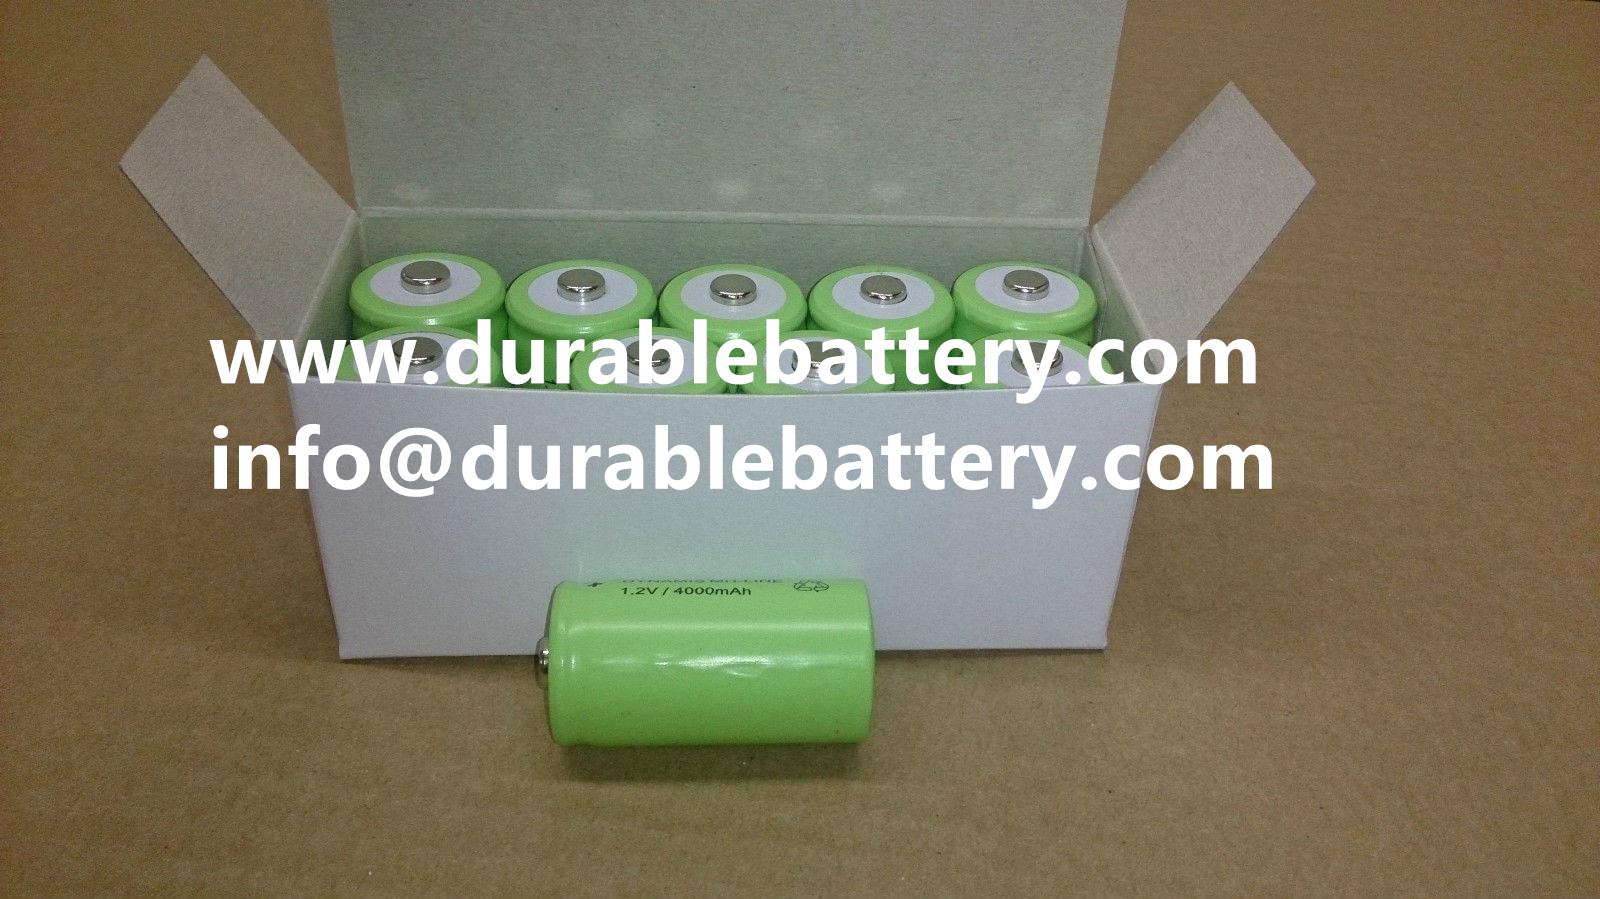 nimh 1.2v 4000mah c type rechargeable batteries for solar lamp